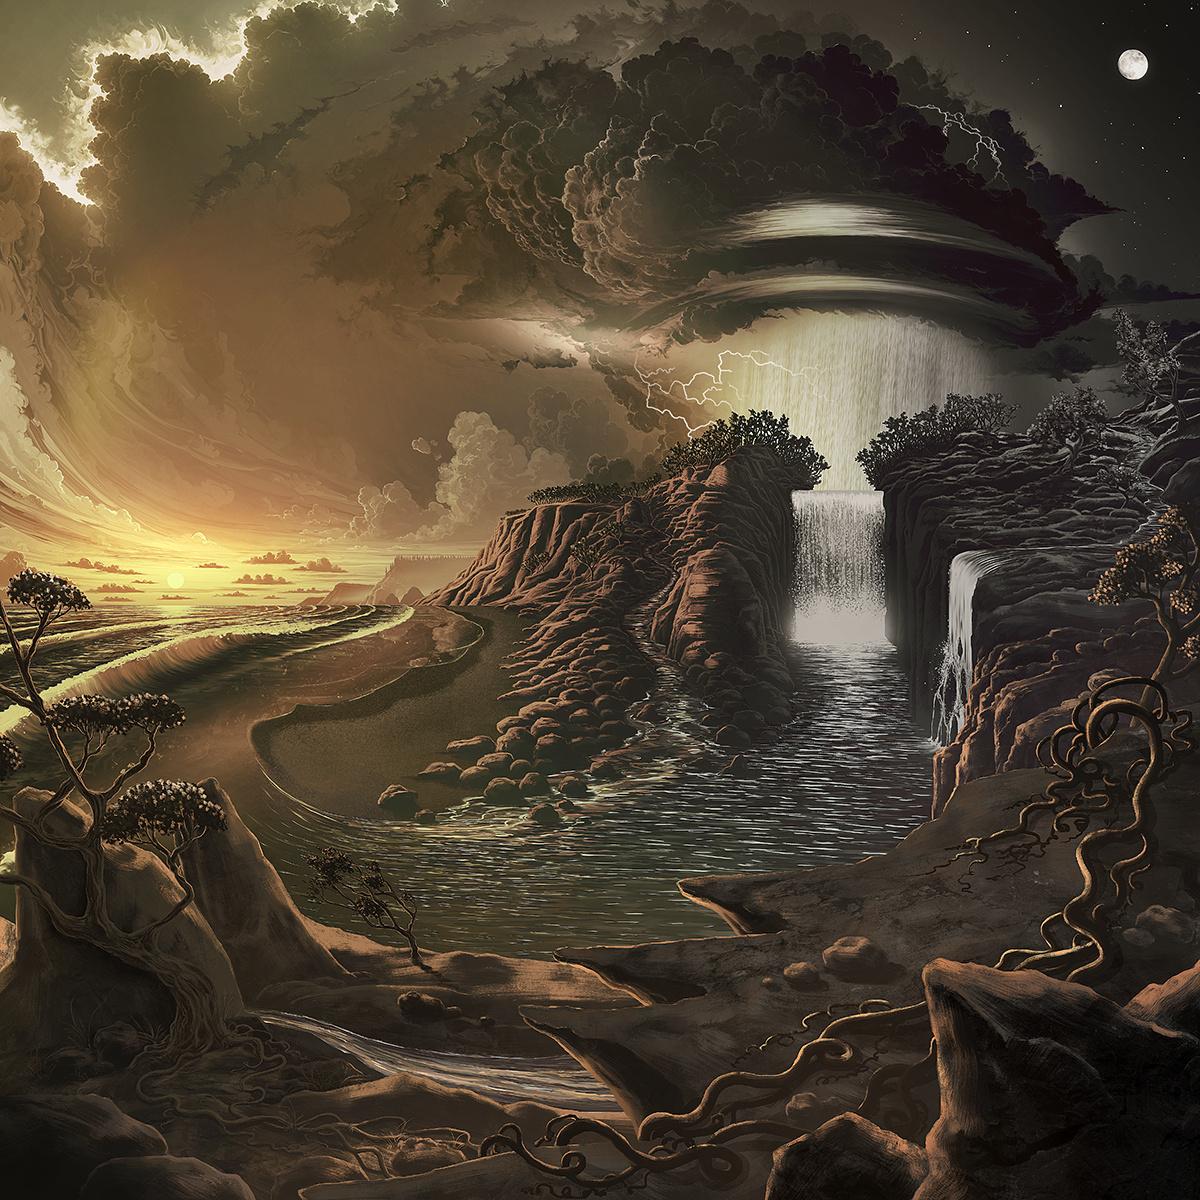 Blog | 24/7 Doom Stoner Sludge | www handofdoomradio com